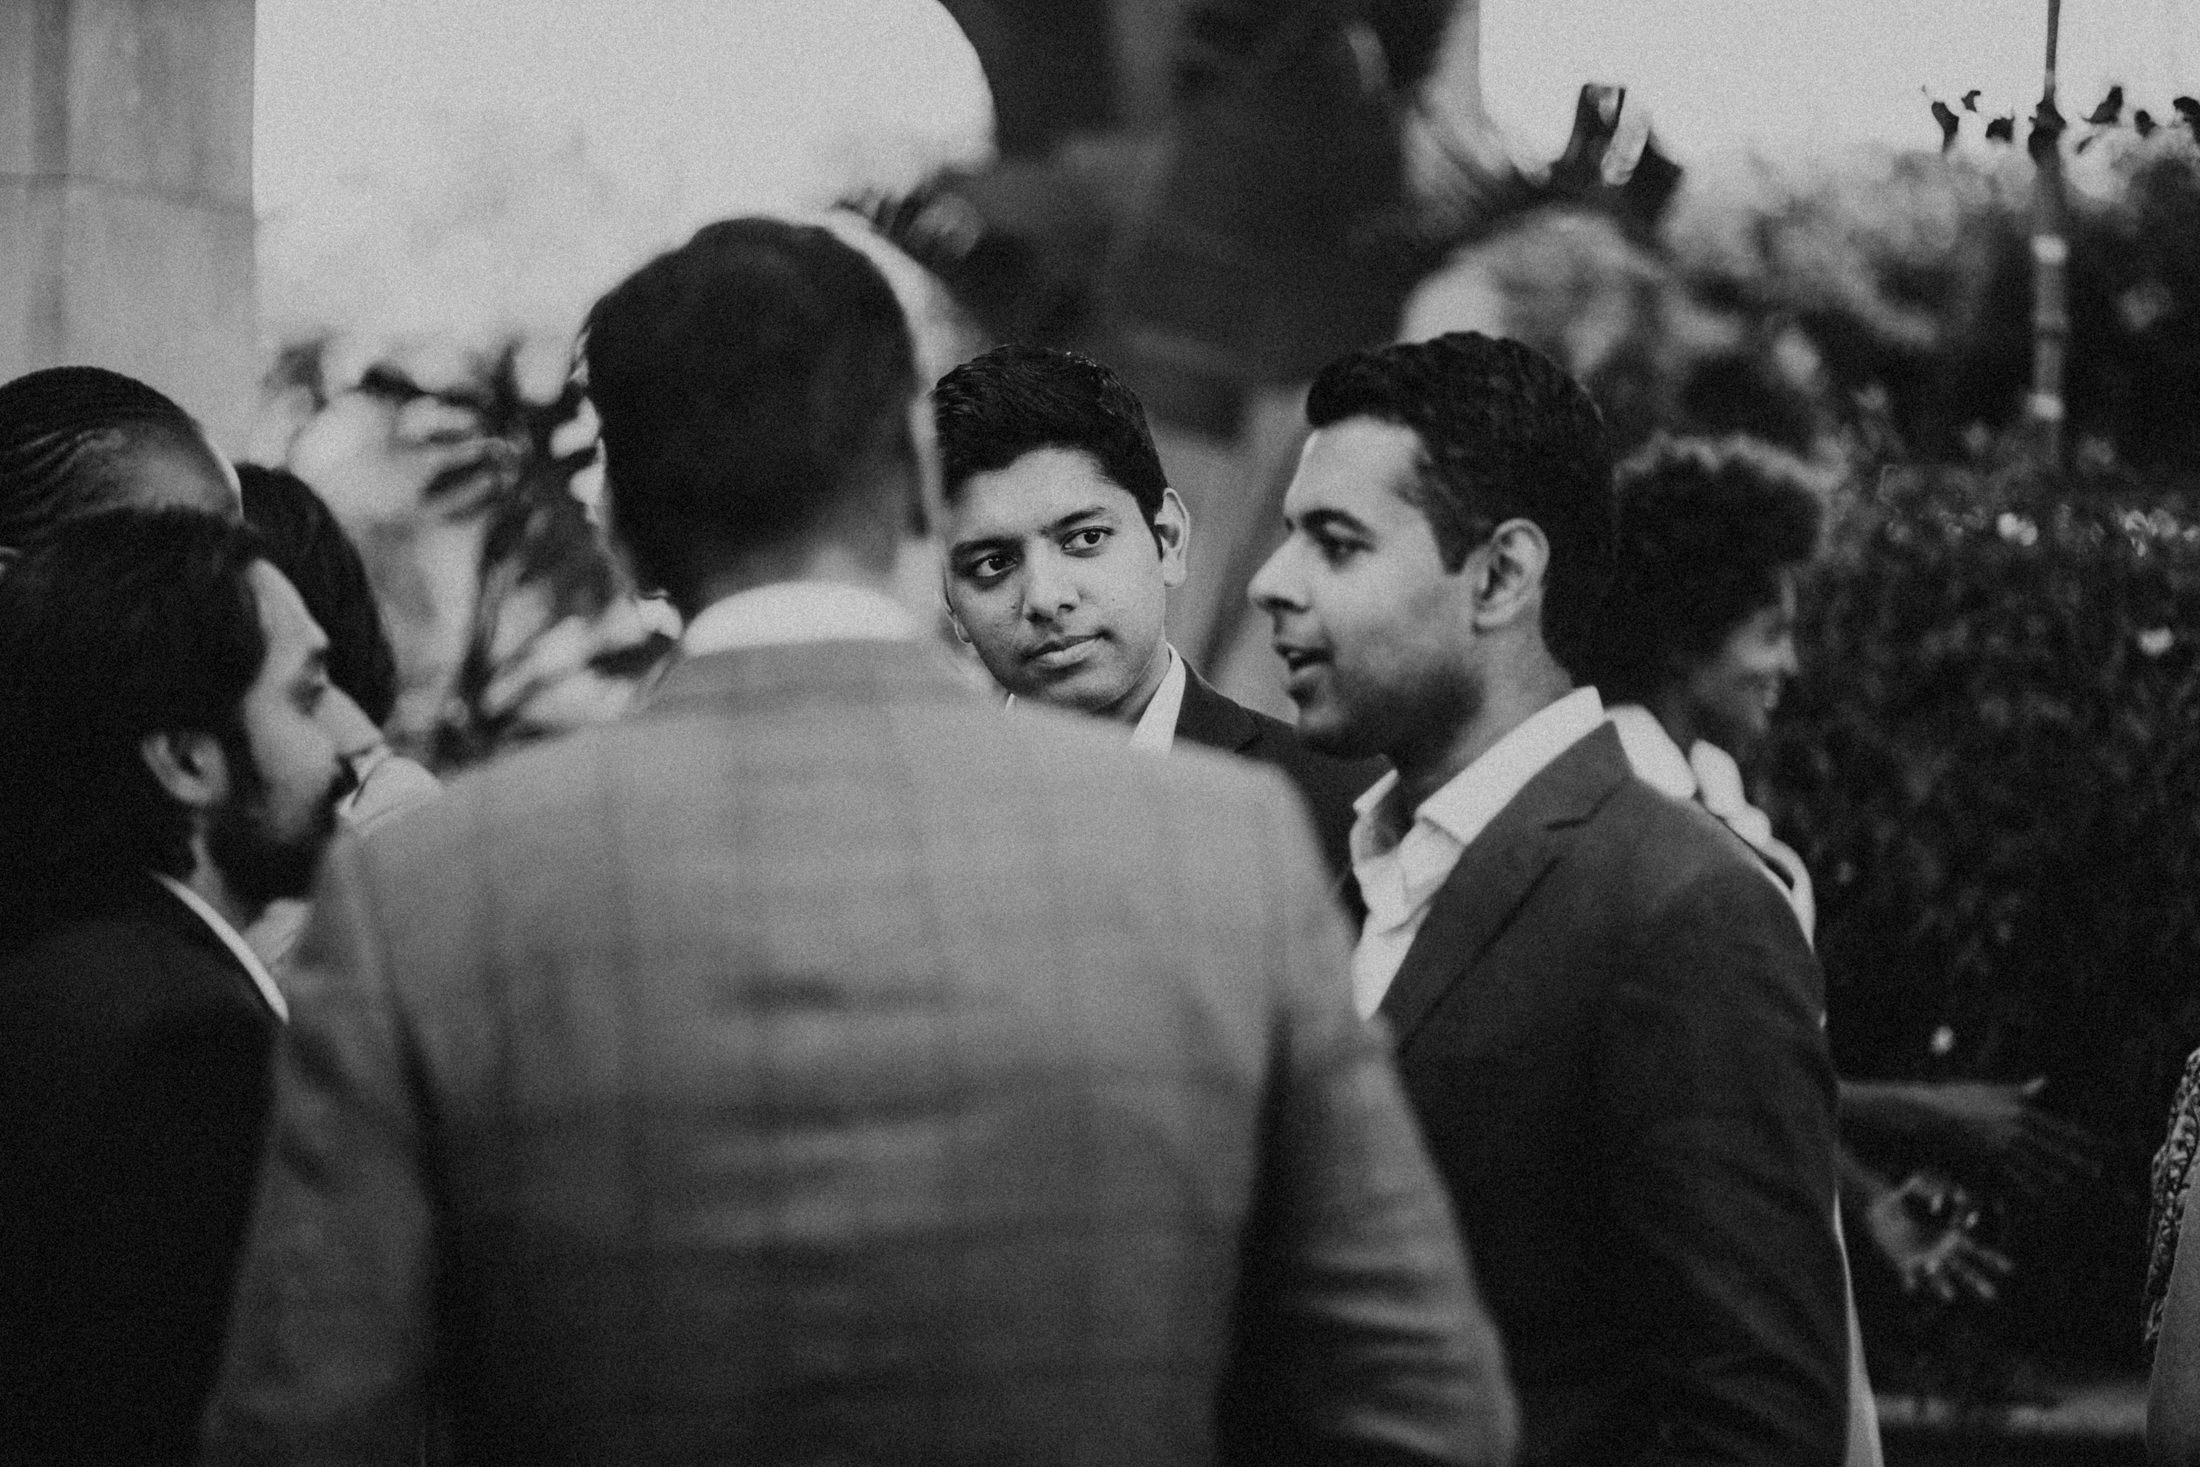 Wedding_Photographer_Mallorca_Daniela-Marquardt_Photography_New_York_Iceland_Tuscany_Santorini_Portugal_Austria_Bavaria_Elopement_Hochzeitsfotograf_AntjeRajat1_42